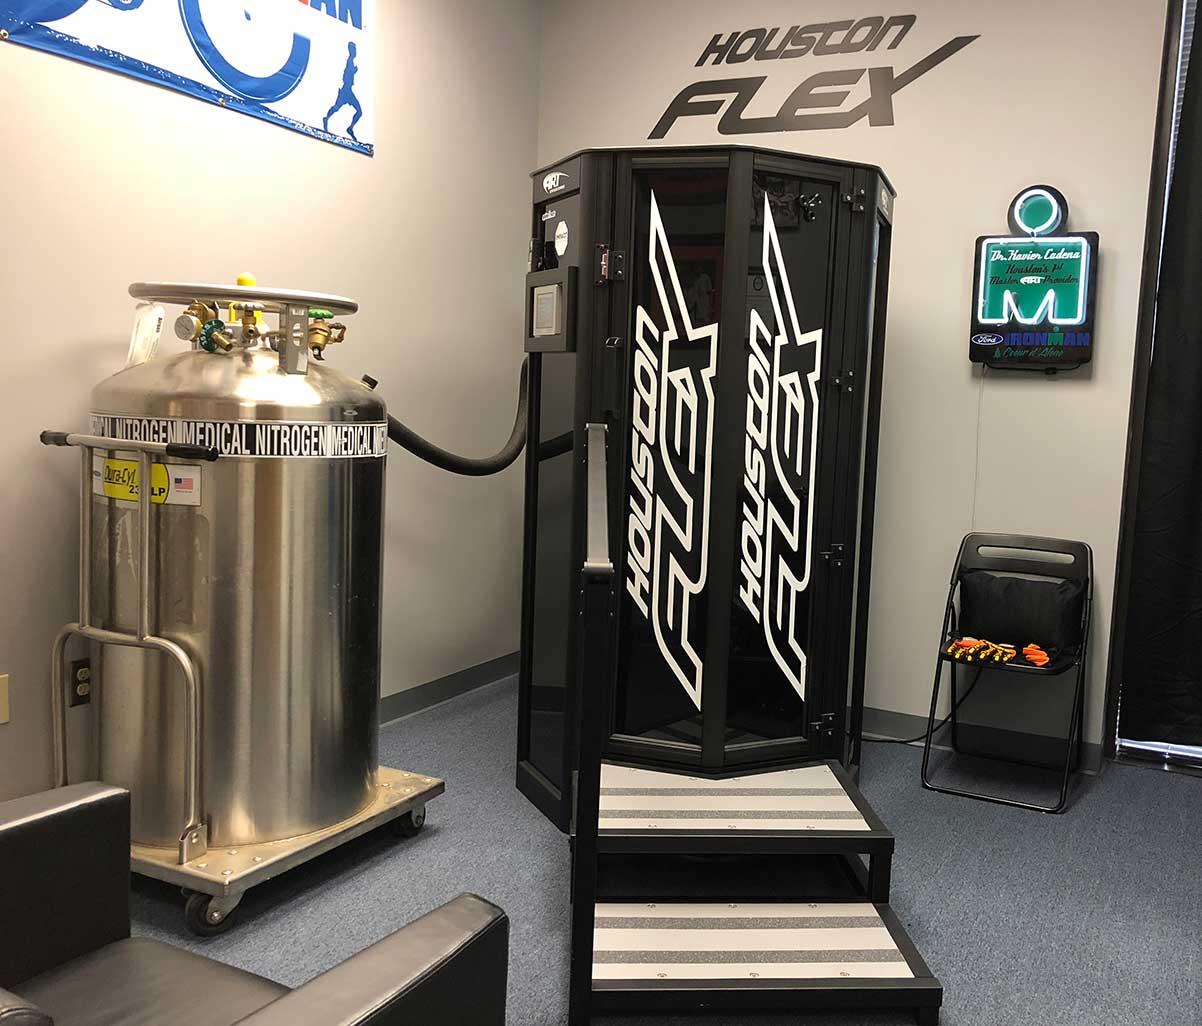 Impact Whole Body Cryotherapy – Houston Flex